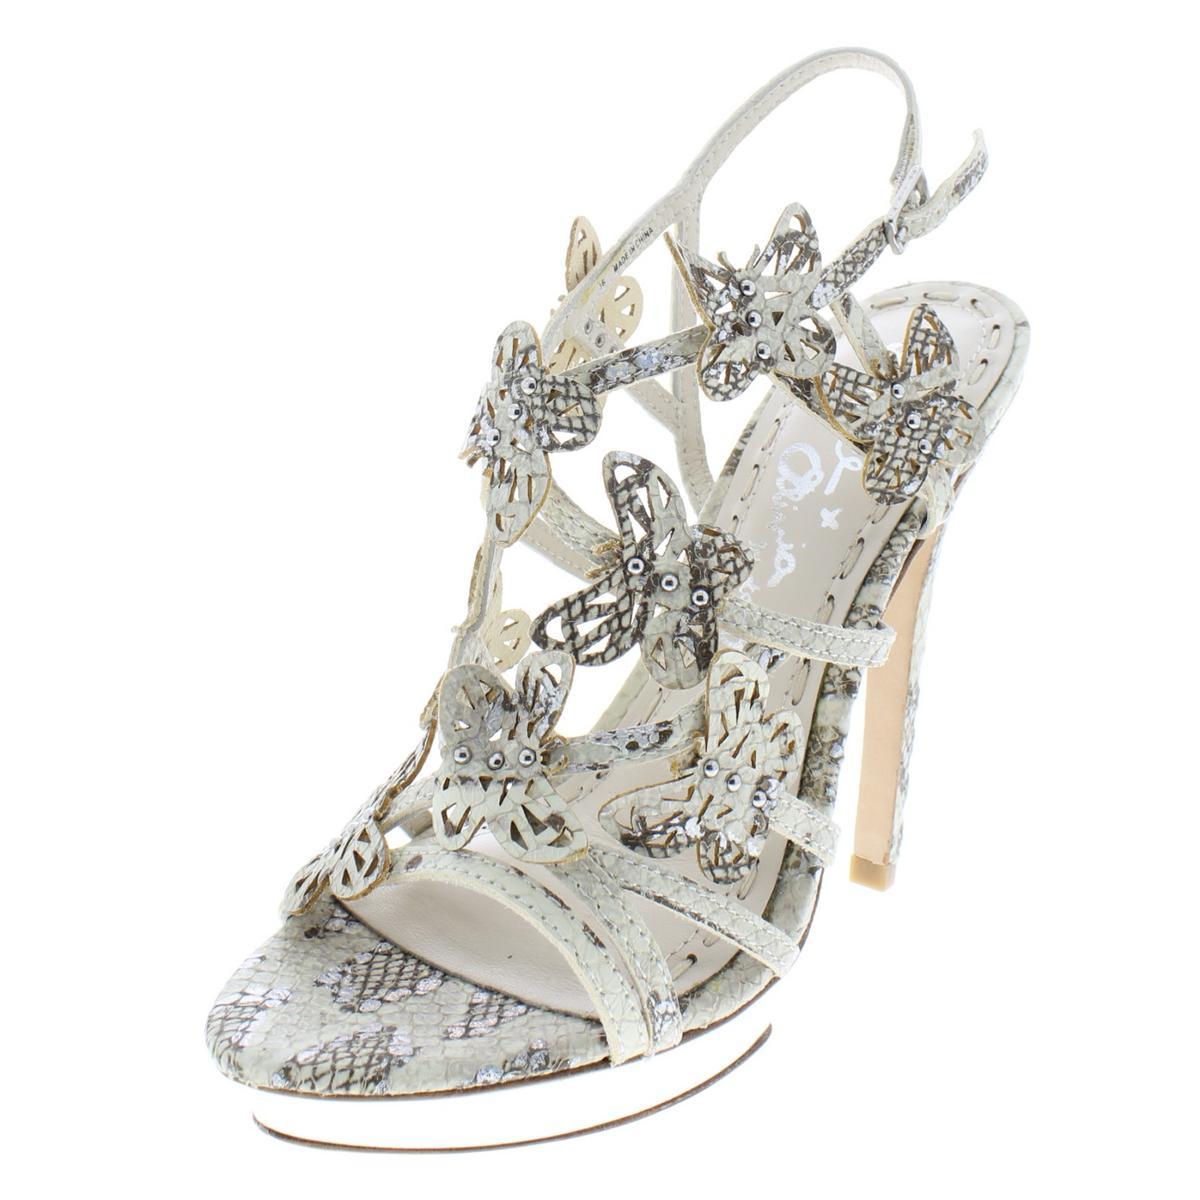 Alice Olivia donna Maria Ivory Evening Sandals 36  Medium (B,M) BHFO 5868  godendo i tuoi acquisti